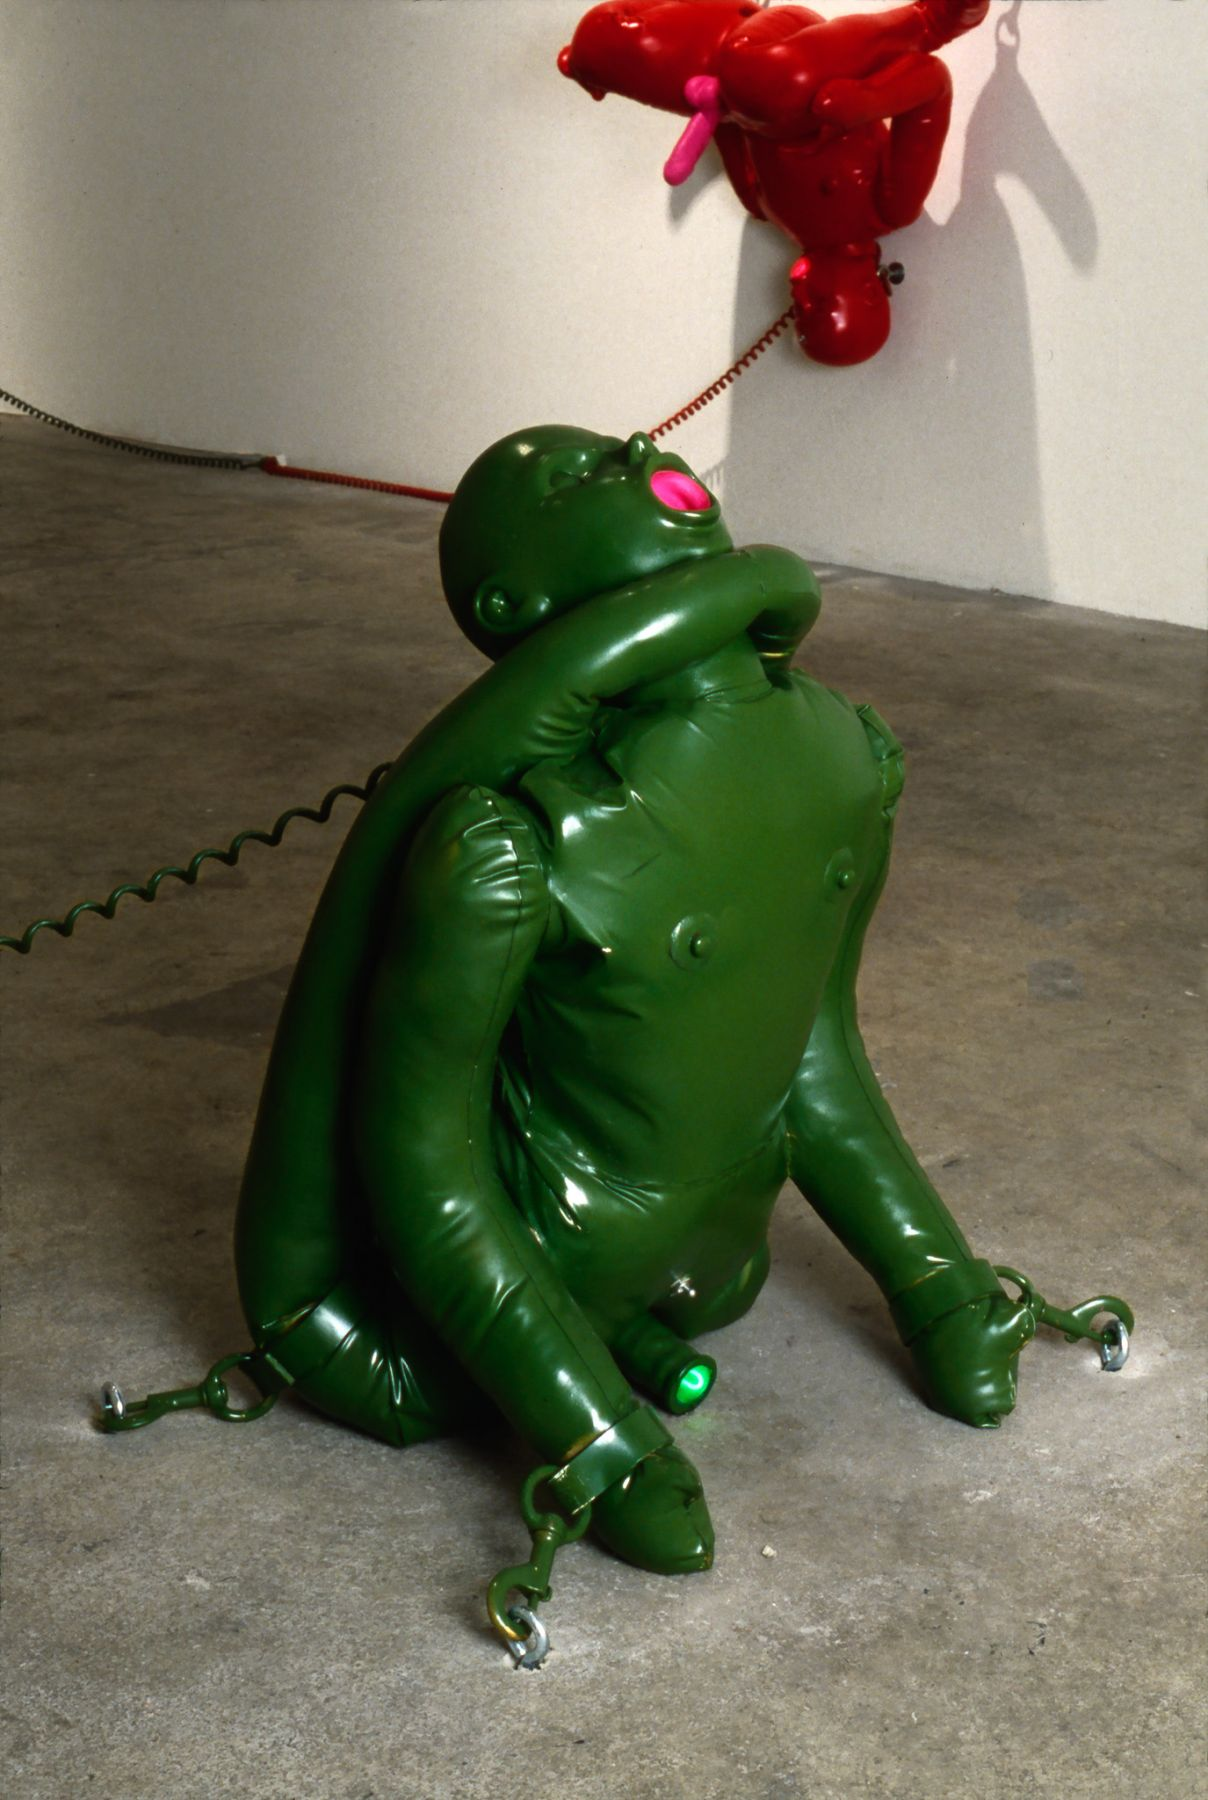 Vito Acconci, Home Entertainment Center, (floor green male), 1991